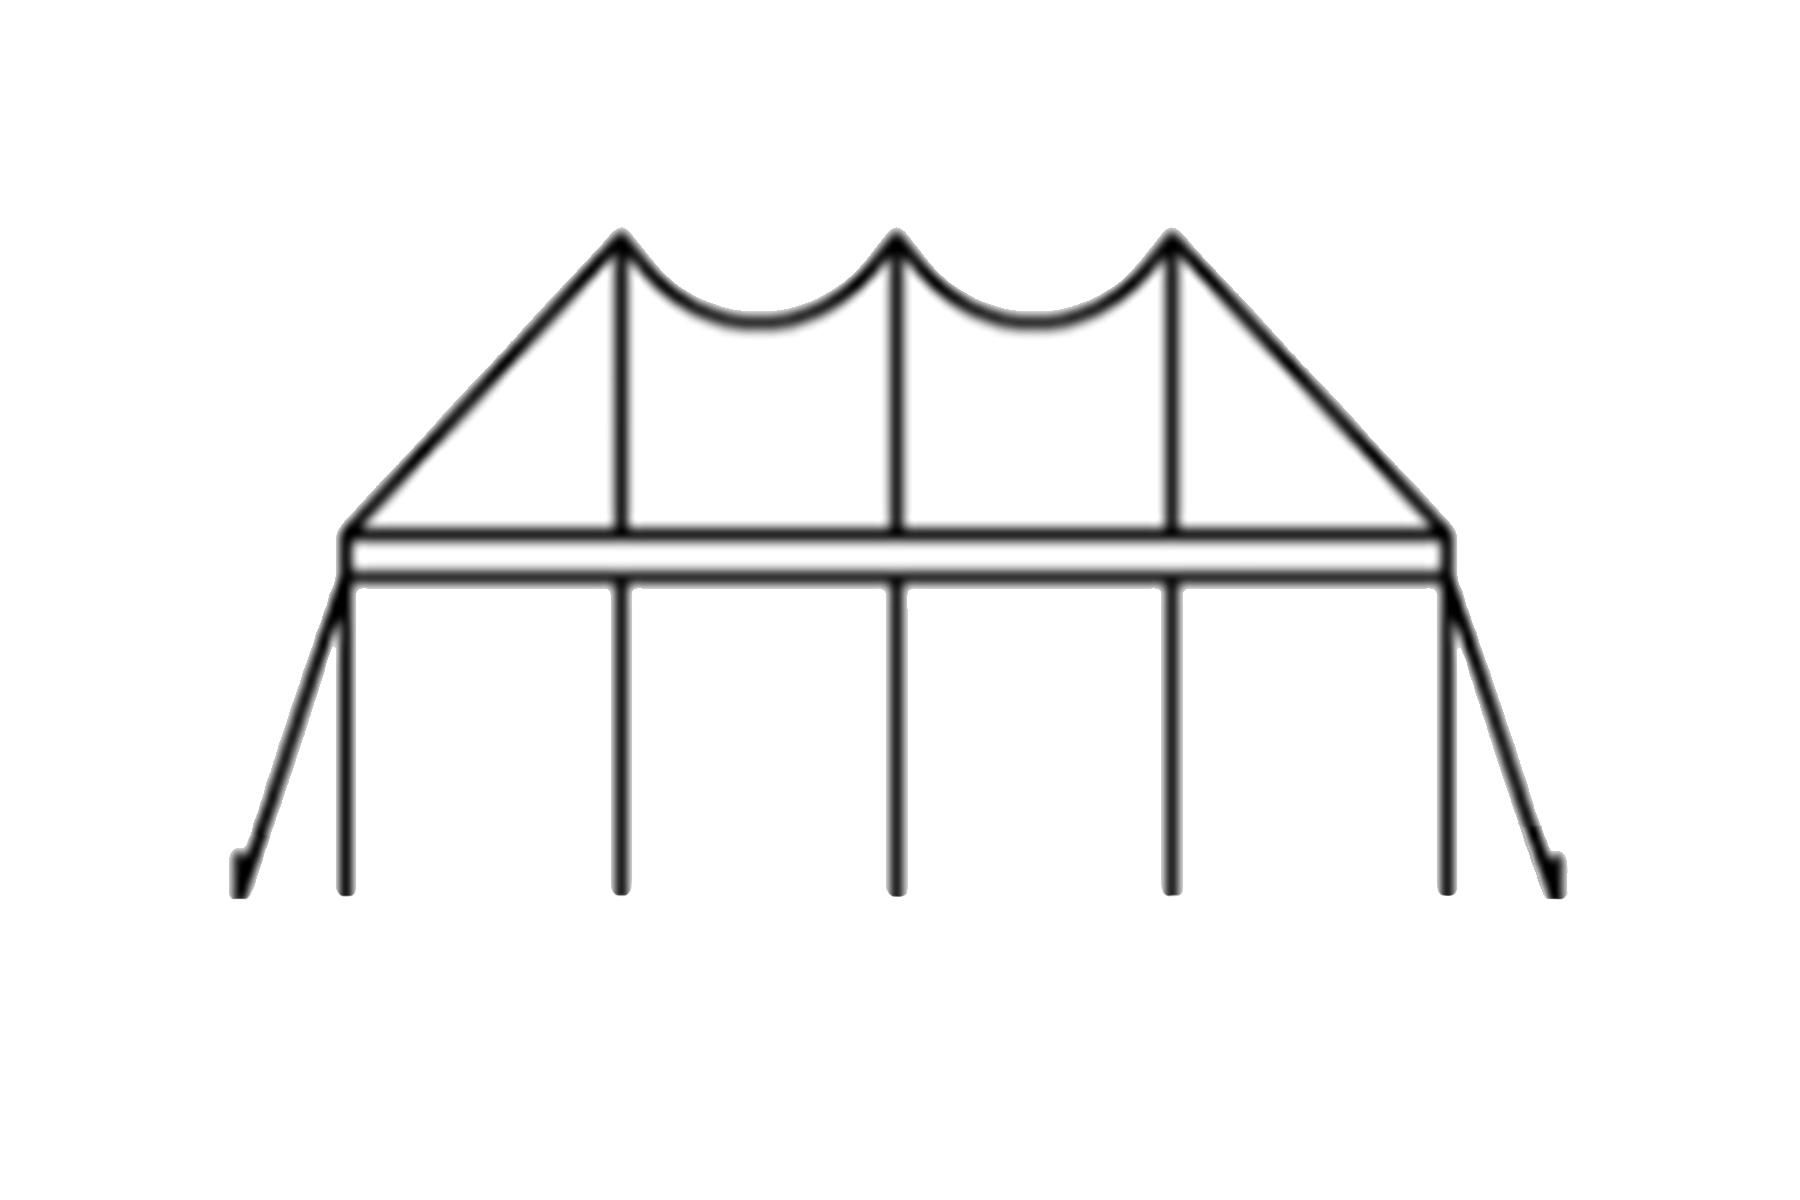 60 x 150 Pole Tent